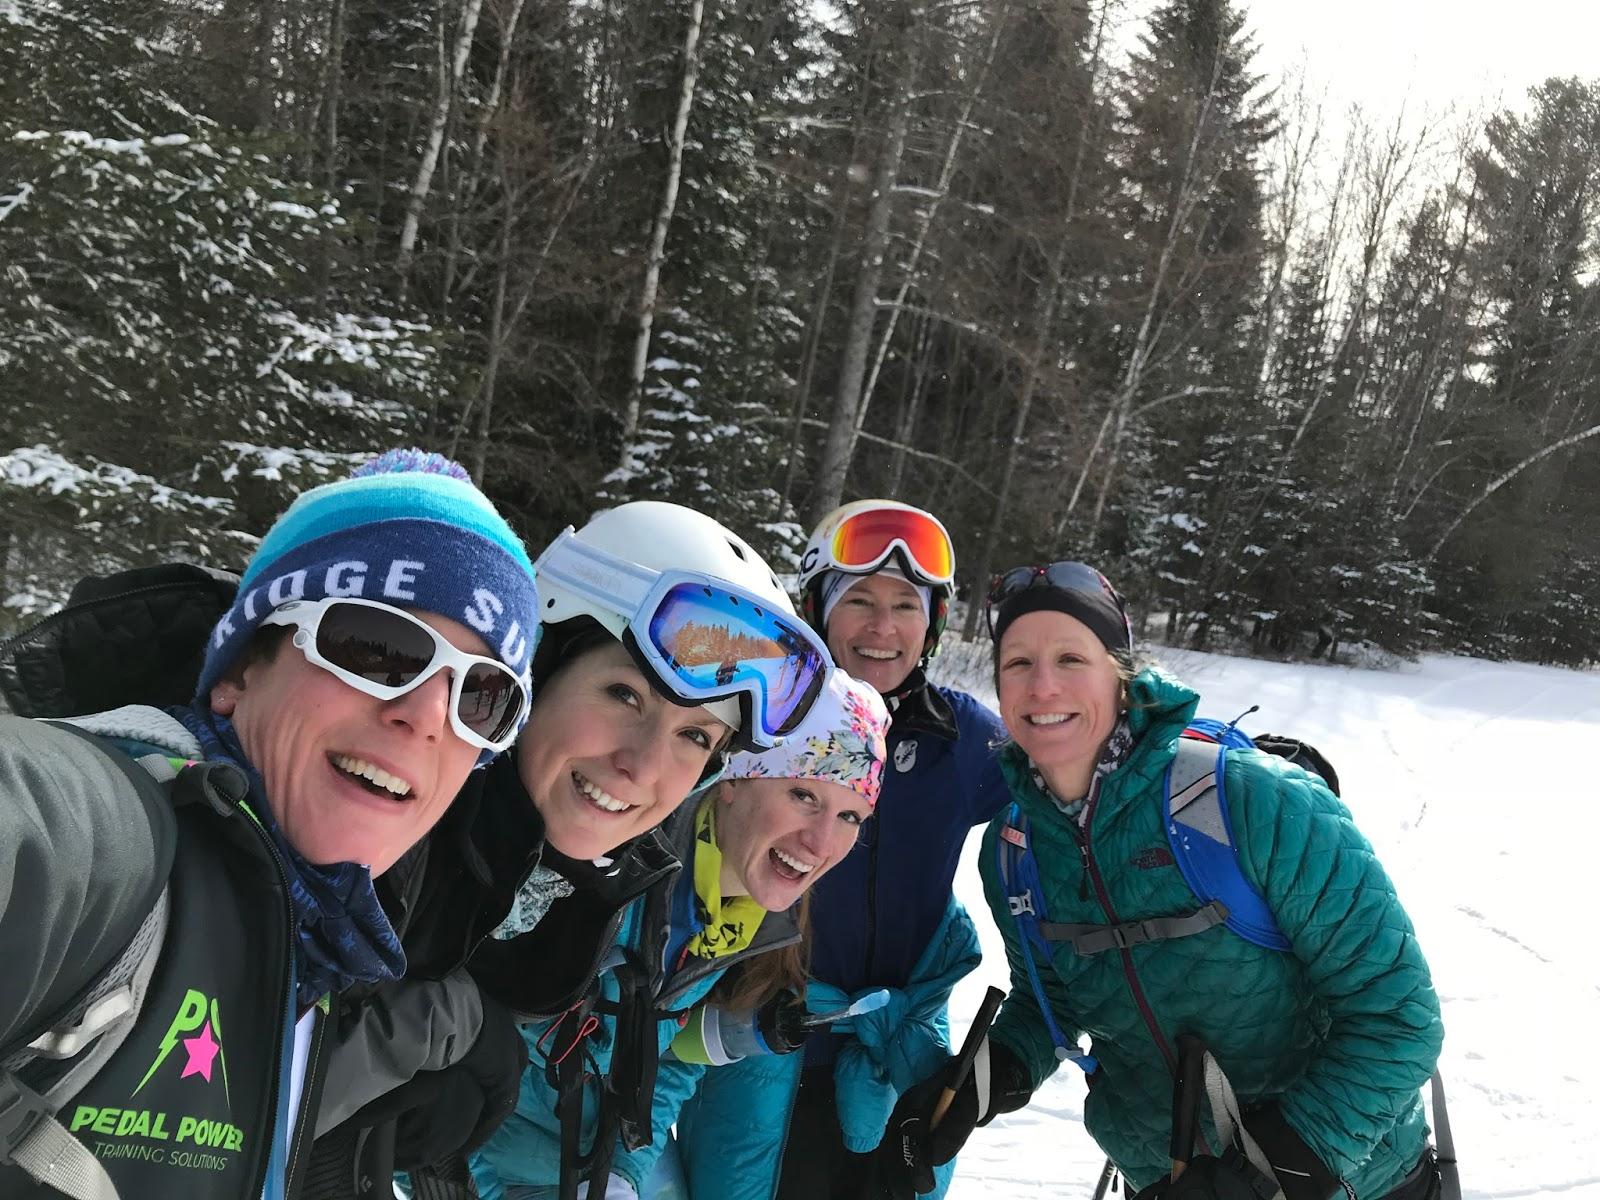 skiing at bittersweet